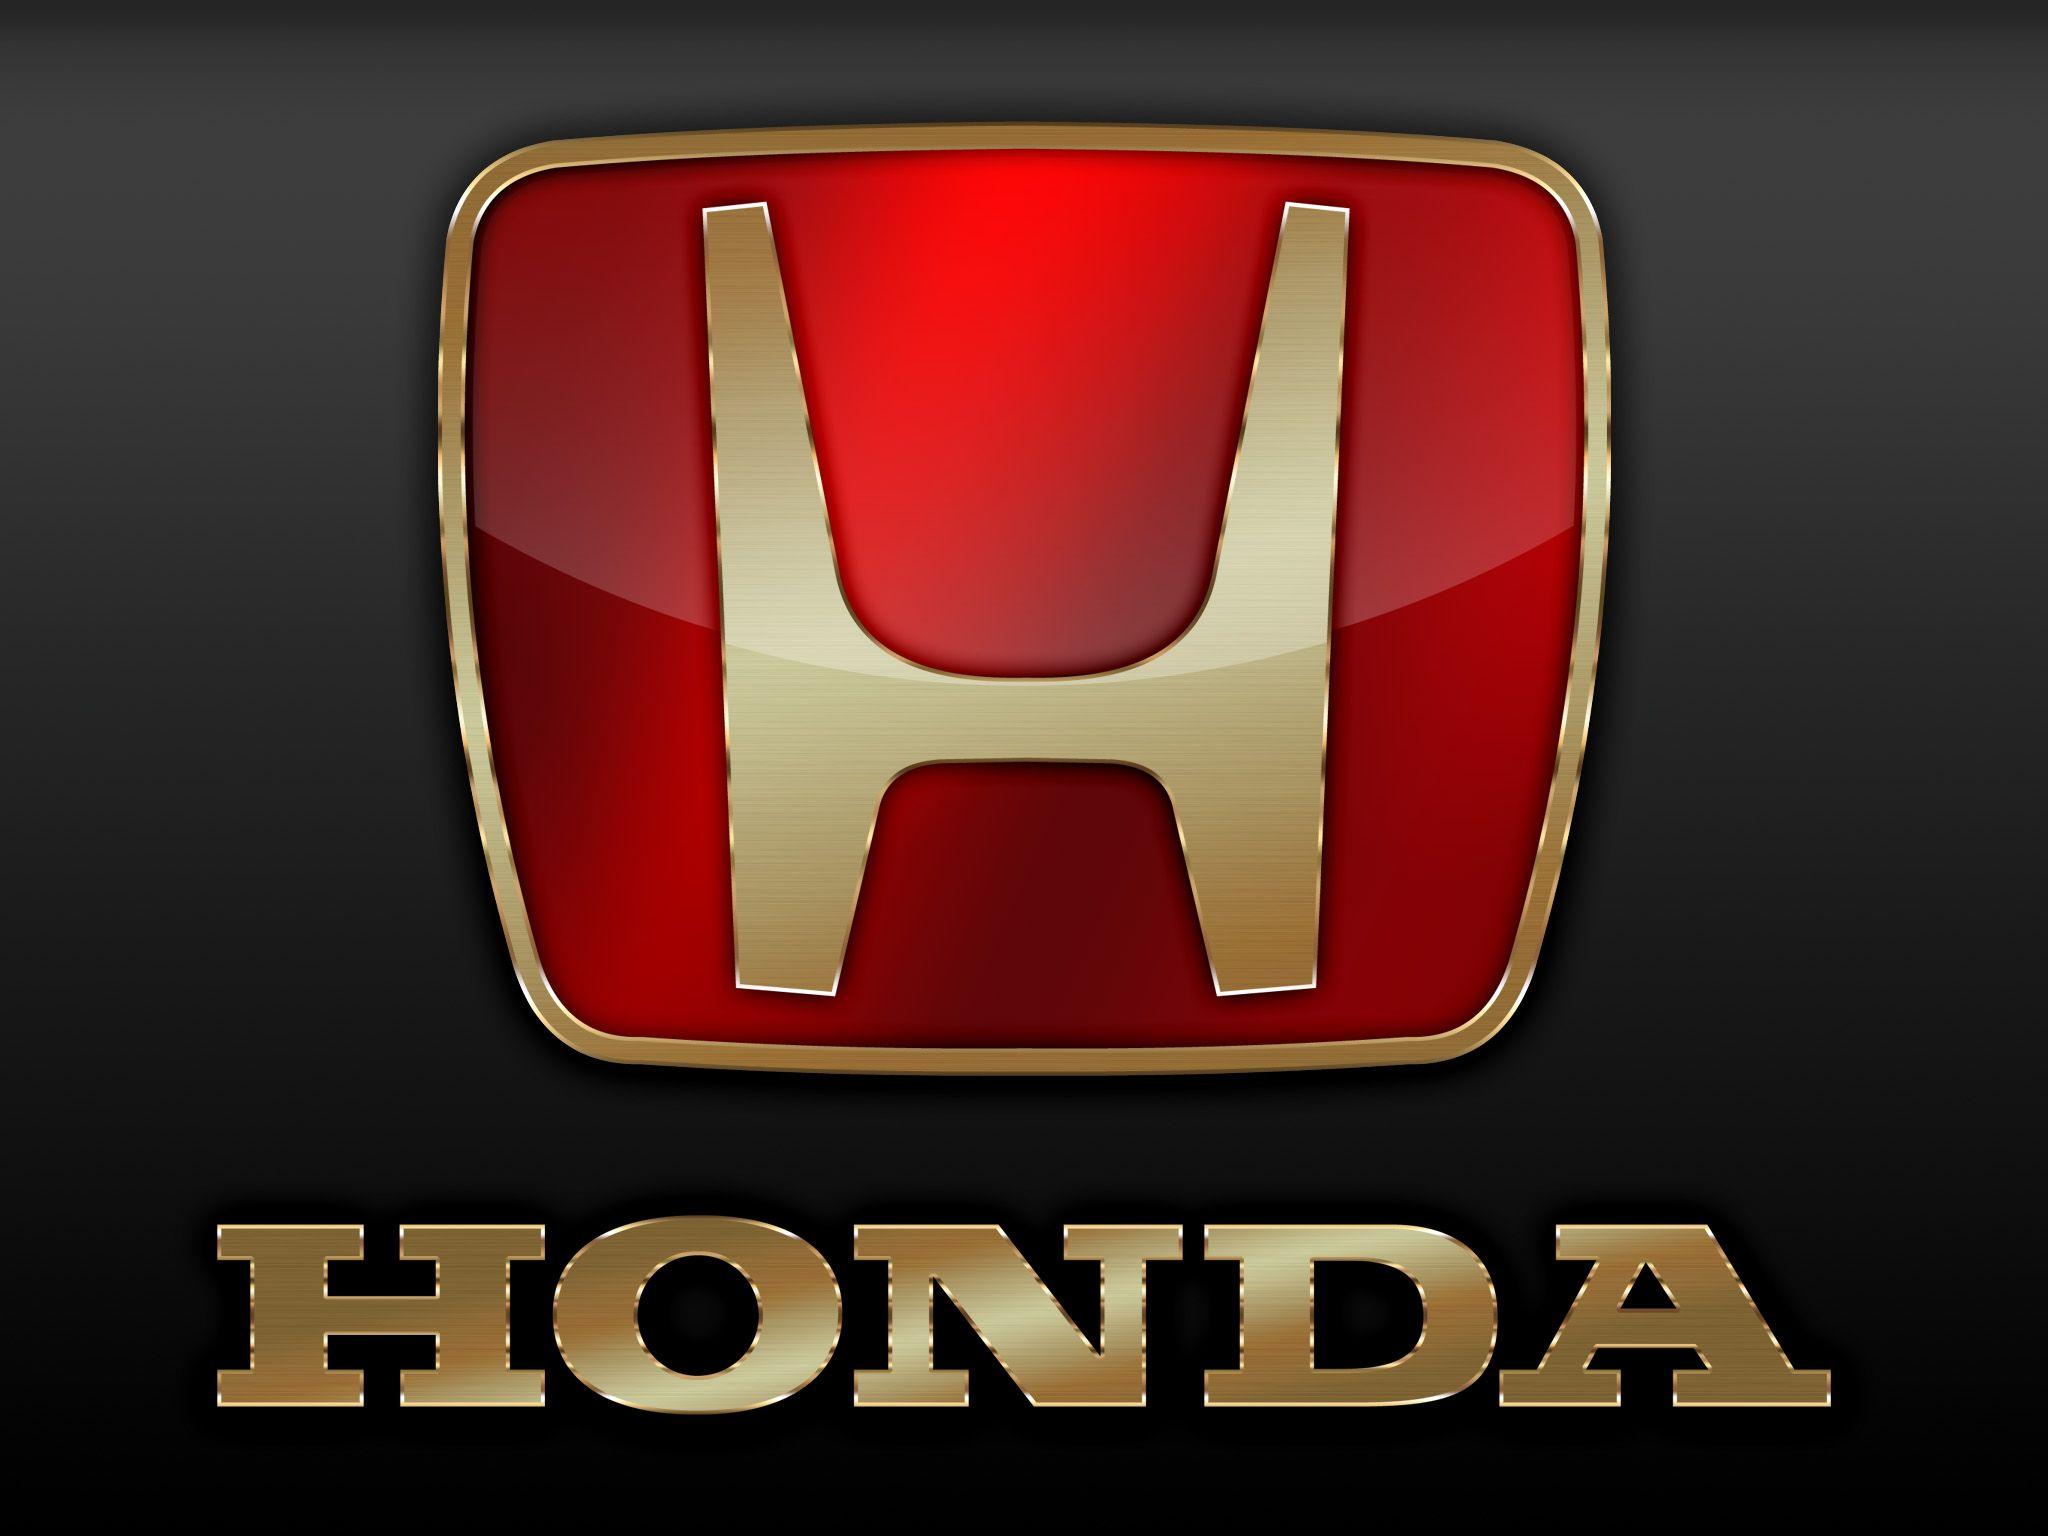 Honda Emblem Logo Wallpaper Honda Wallpaper Hd 2112600